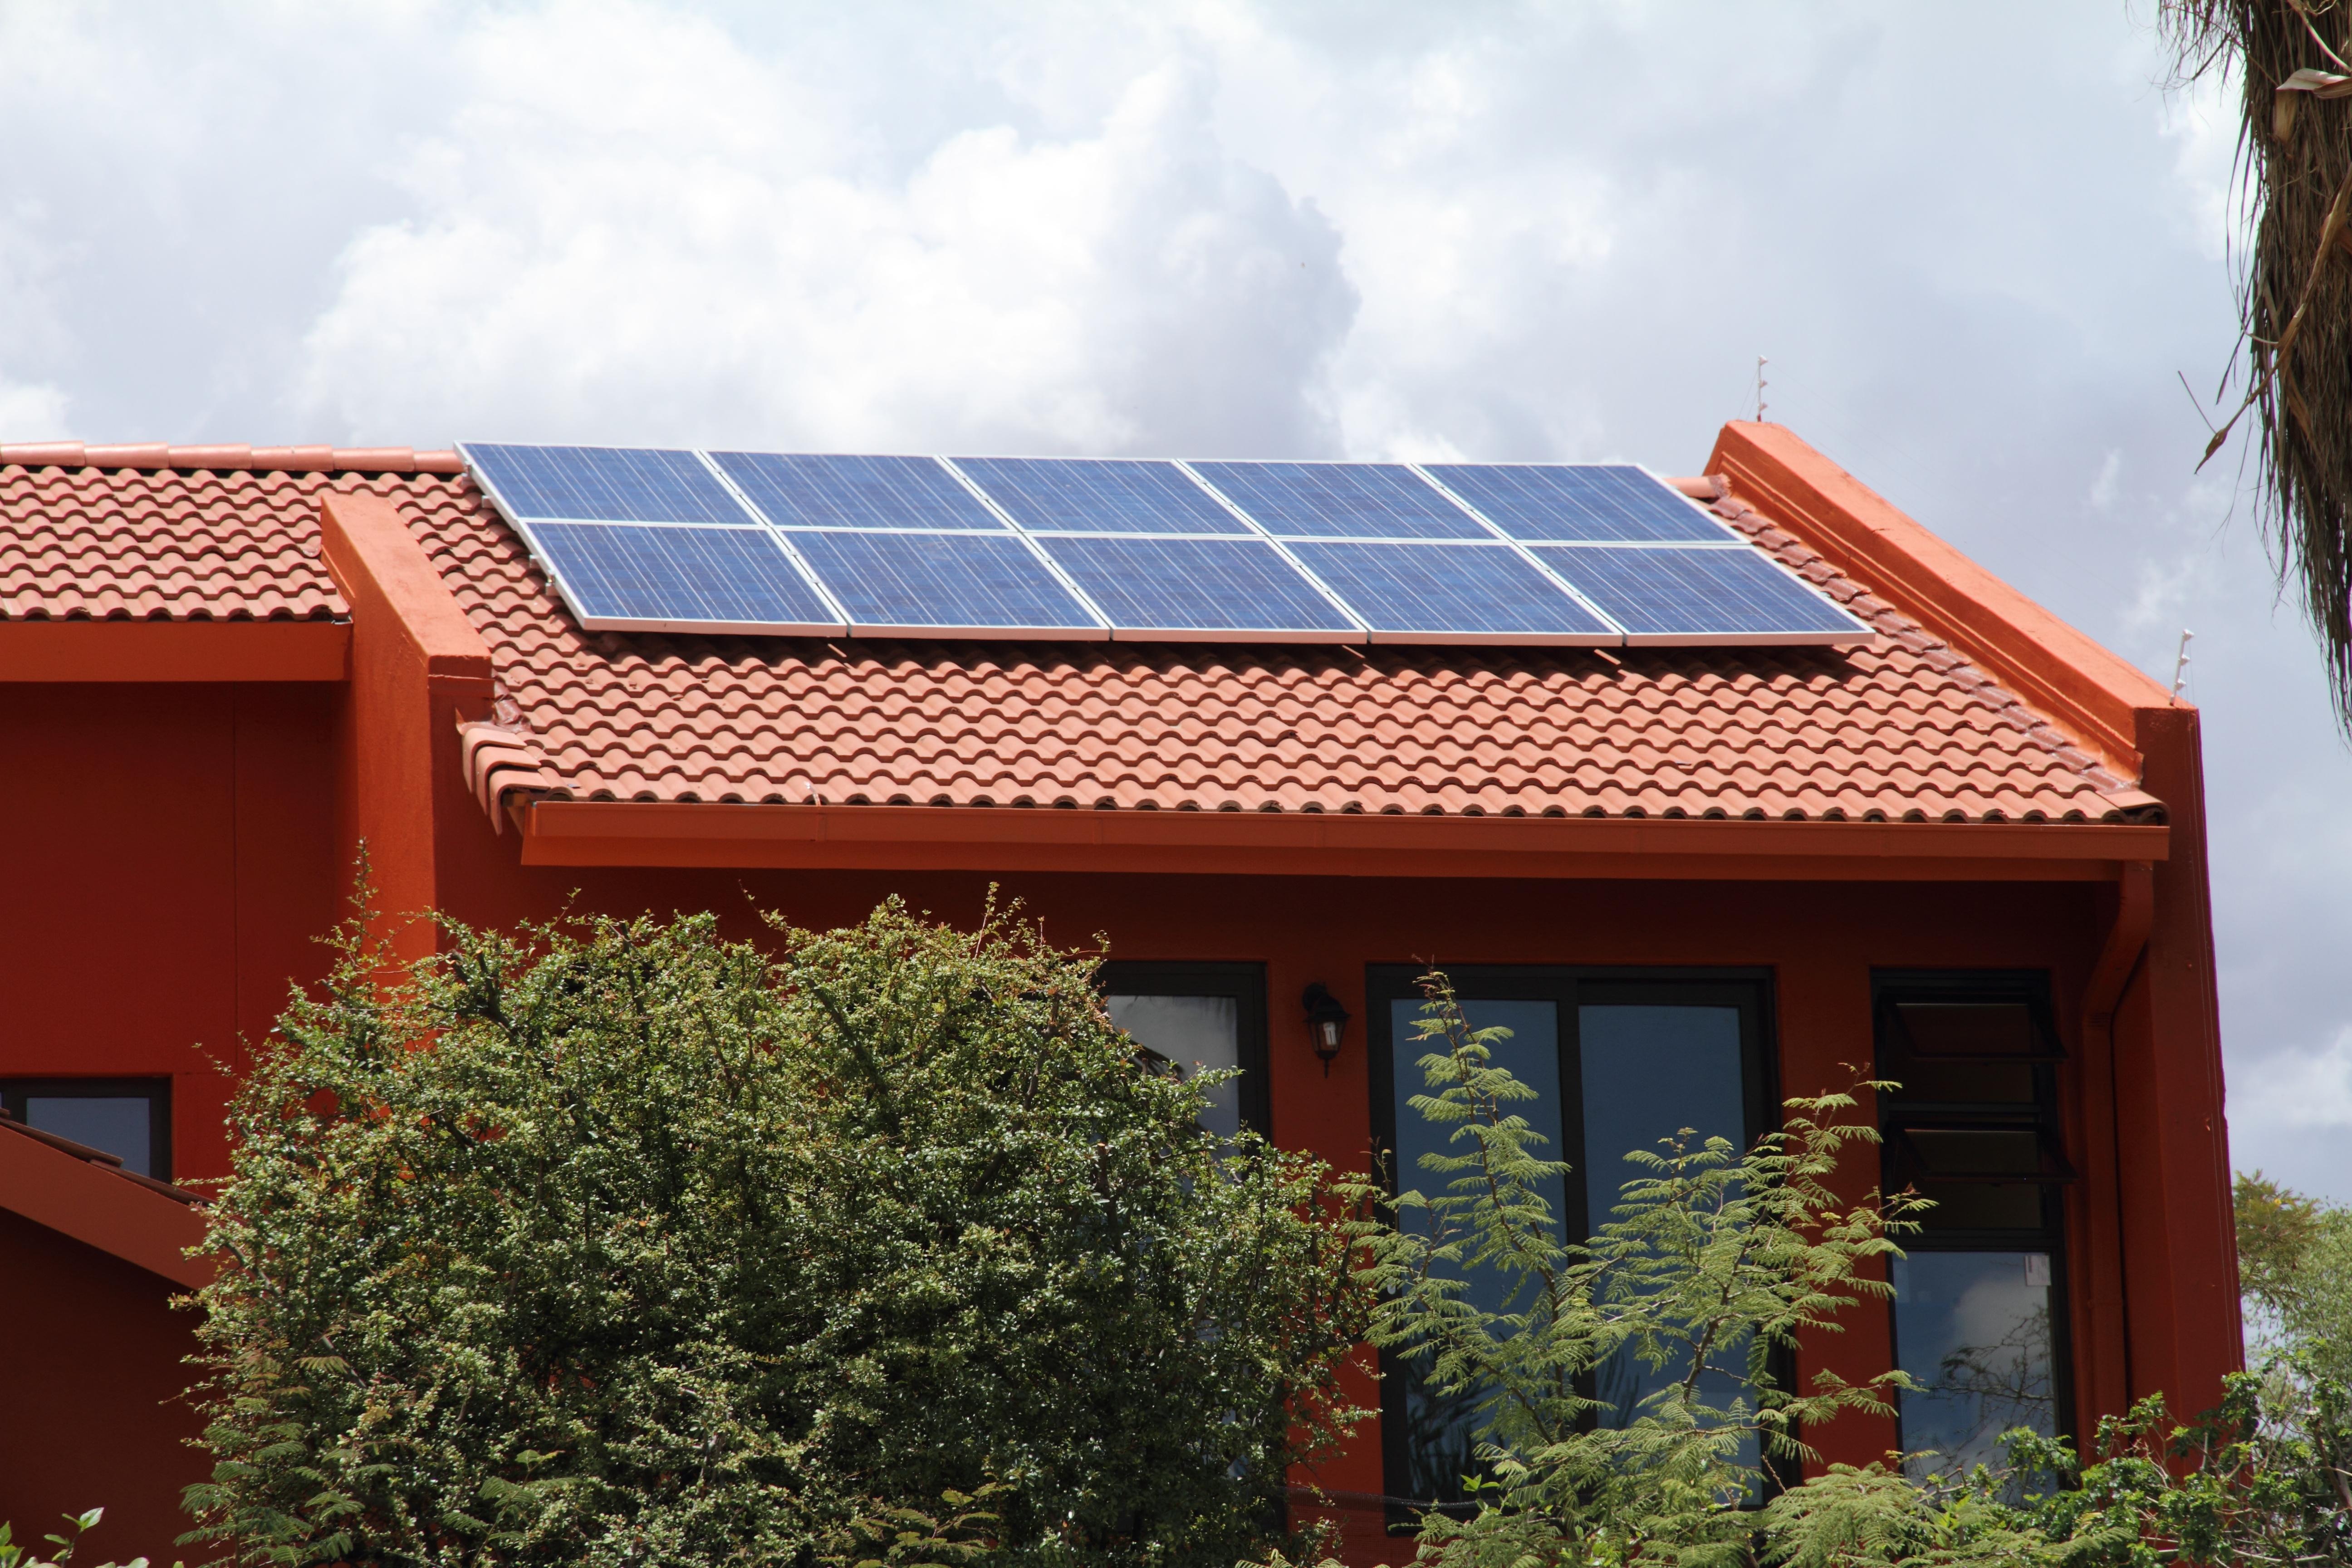 Whk Roof tiles0052